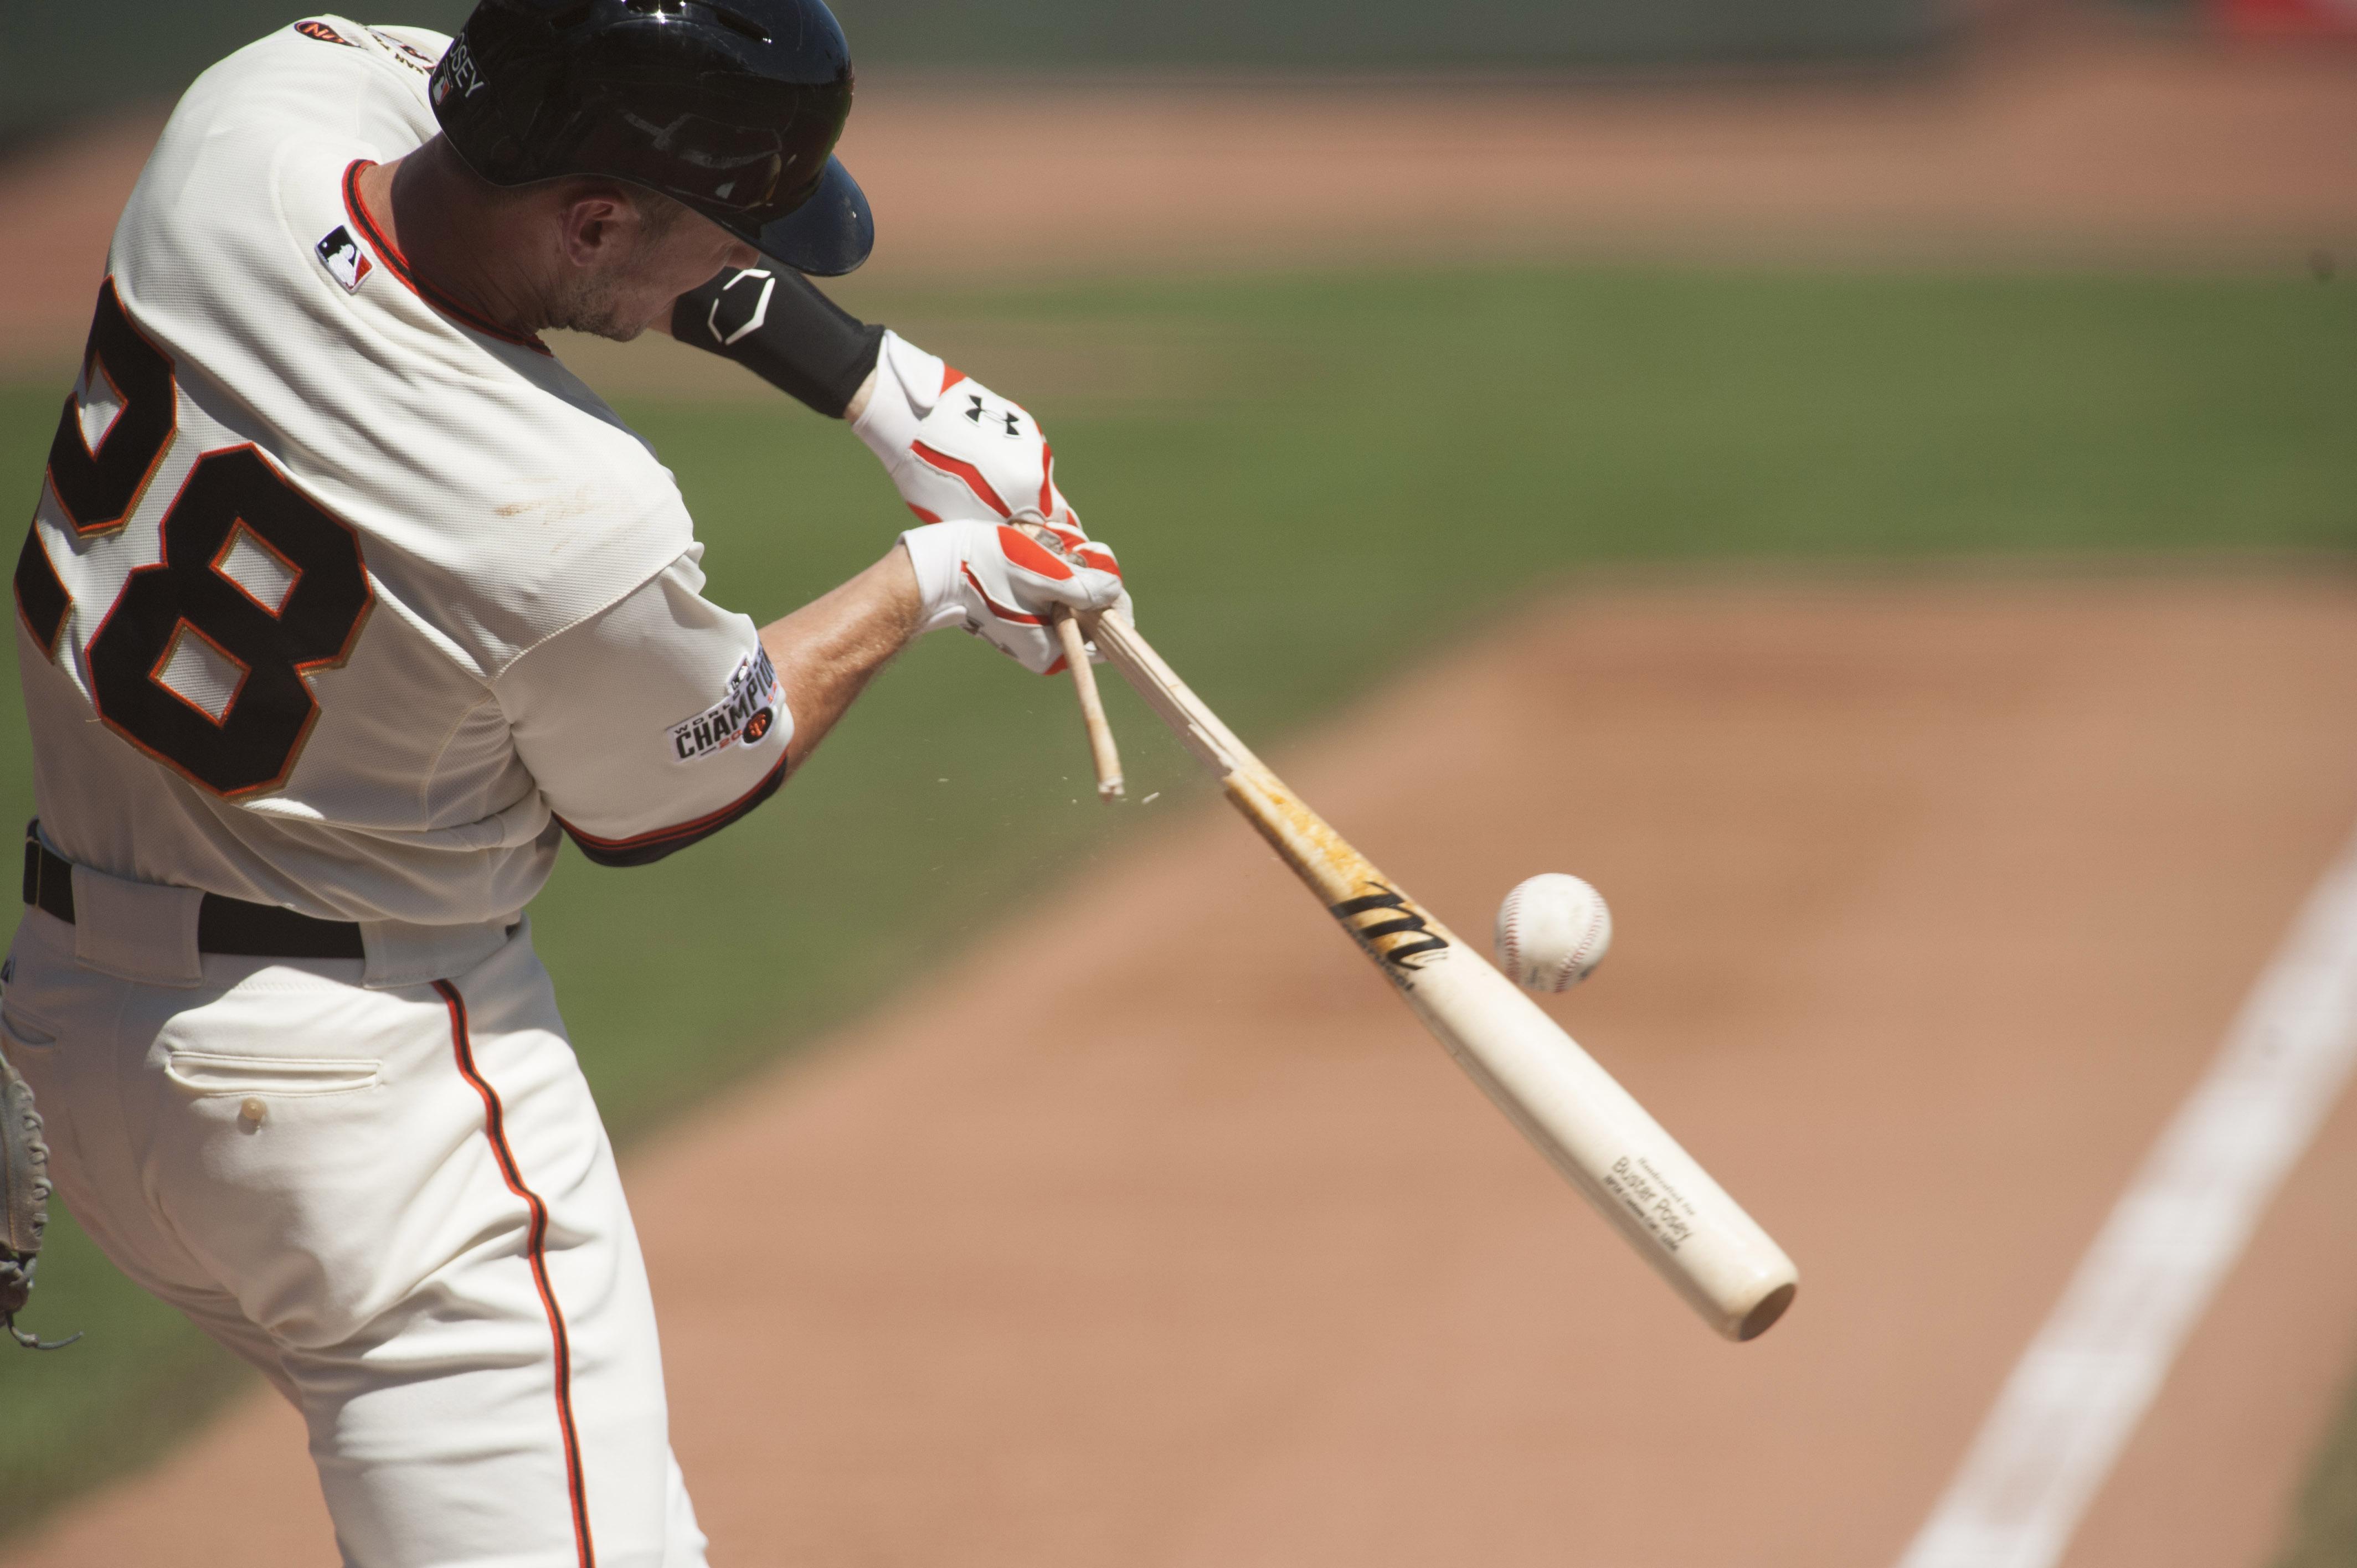 Sep 20, 2015; San Francisco, CA, USA; San Francisco Giants catcher Buster Posey (28) breaks his bat against the Arizona Diamondbacks during the first inning at AT&T Park. Mandatory Credit: Ed Szczepanski-USA TODAY Sports